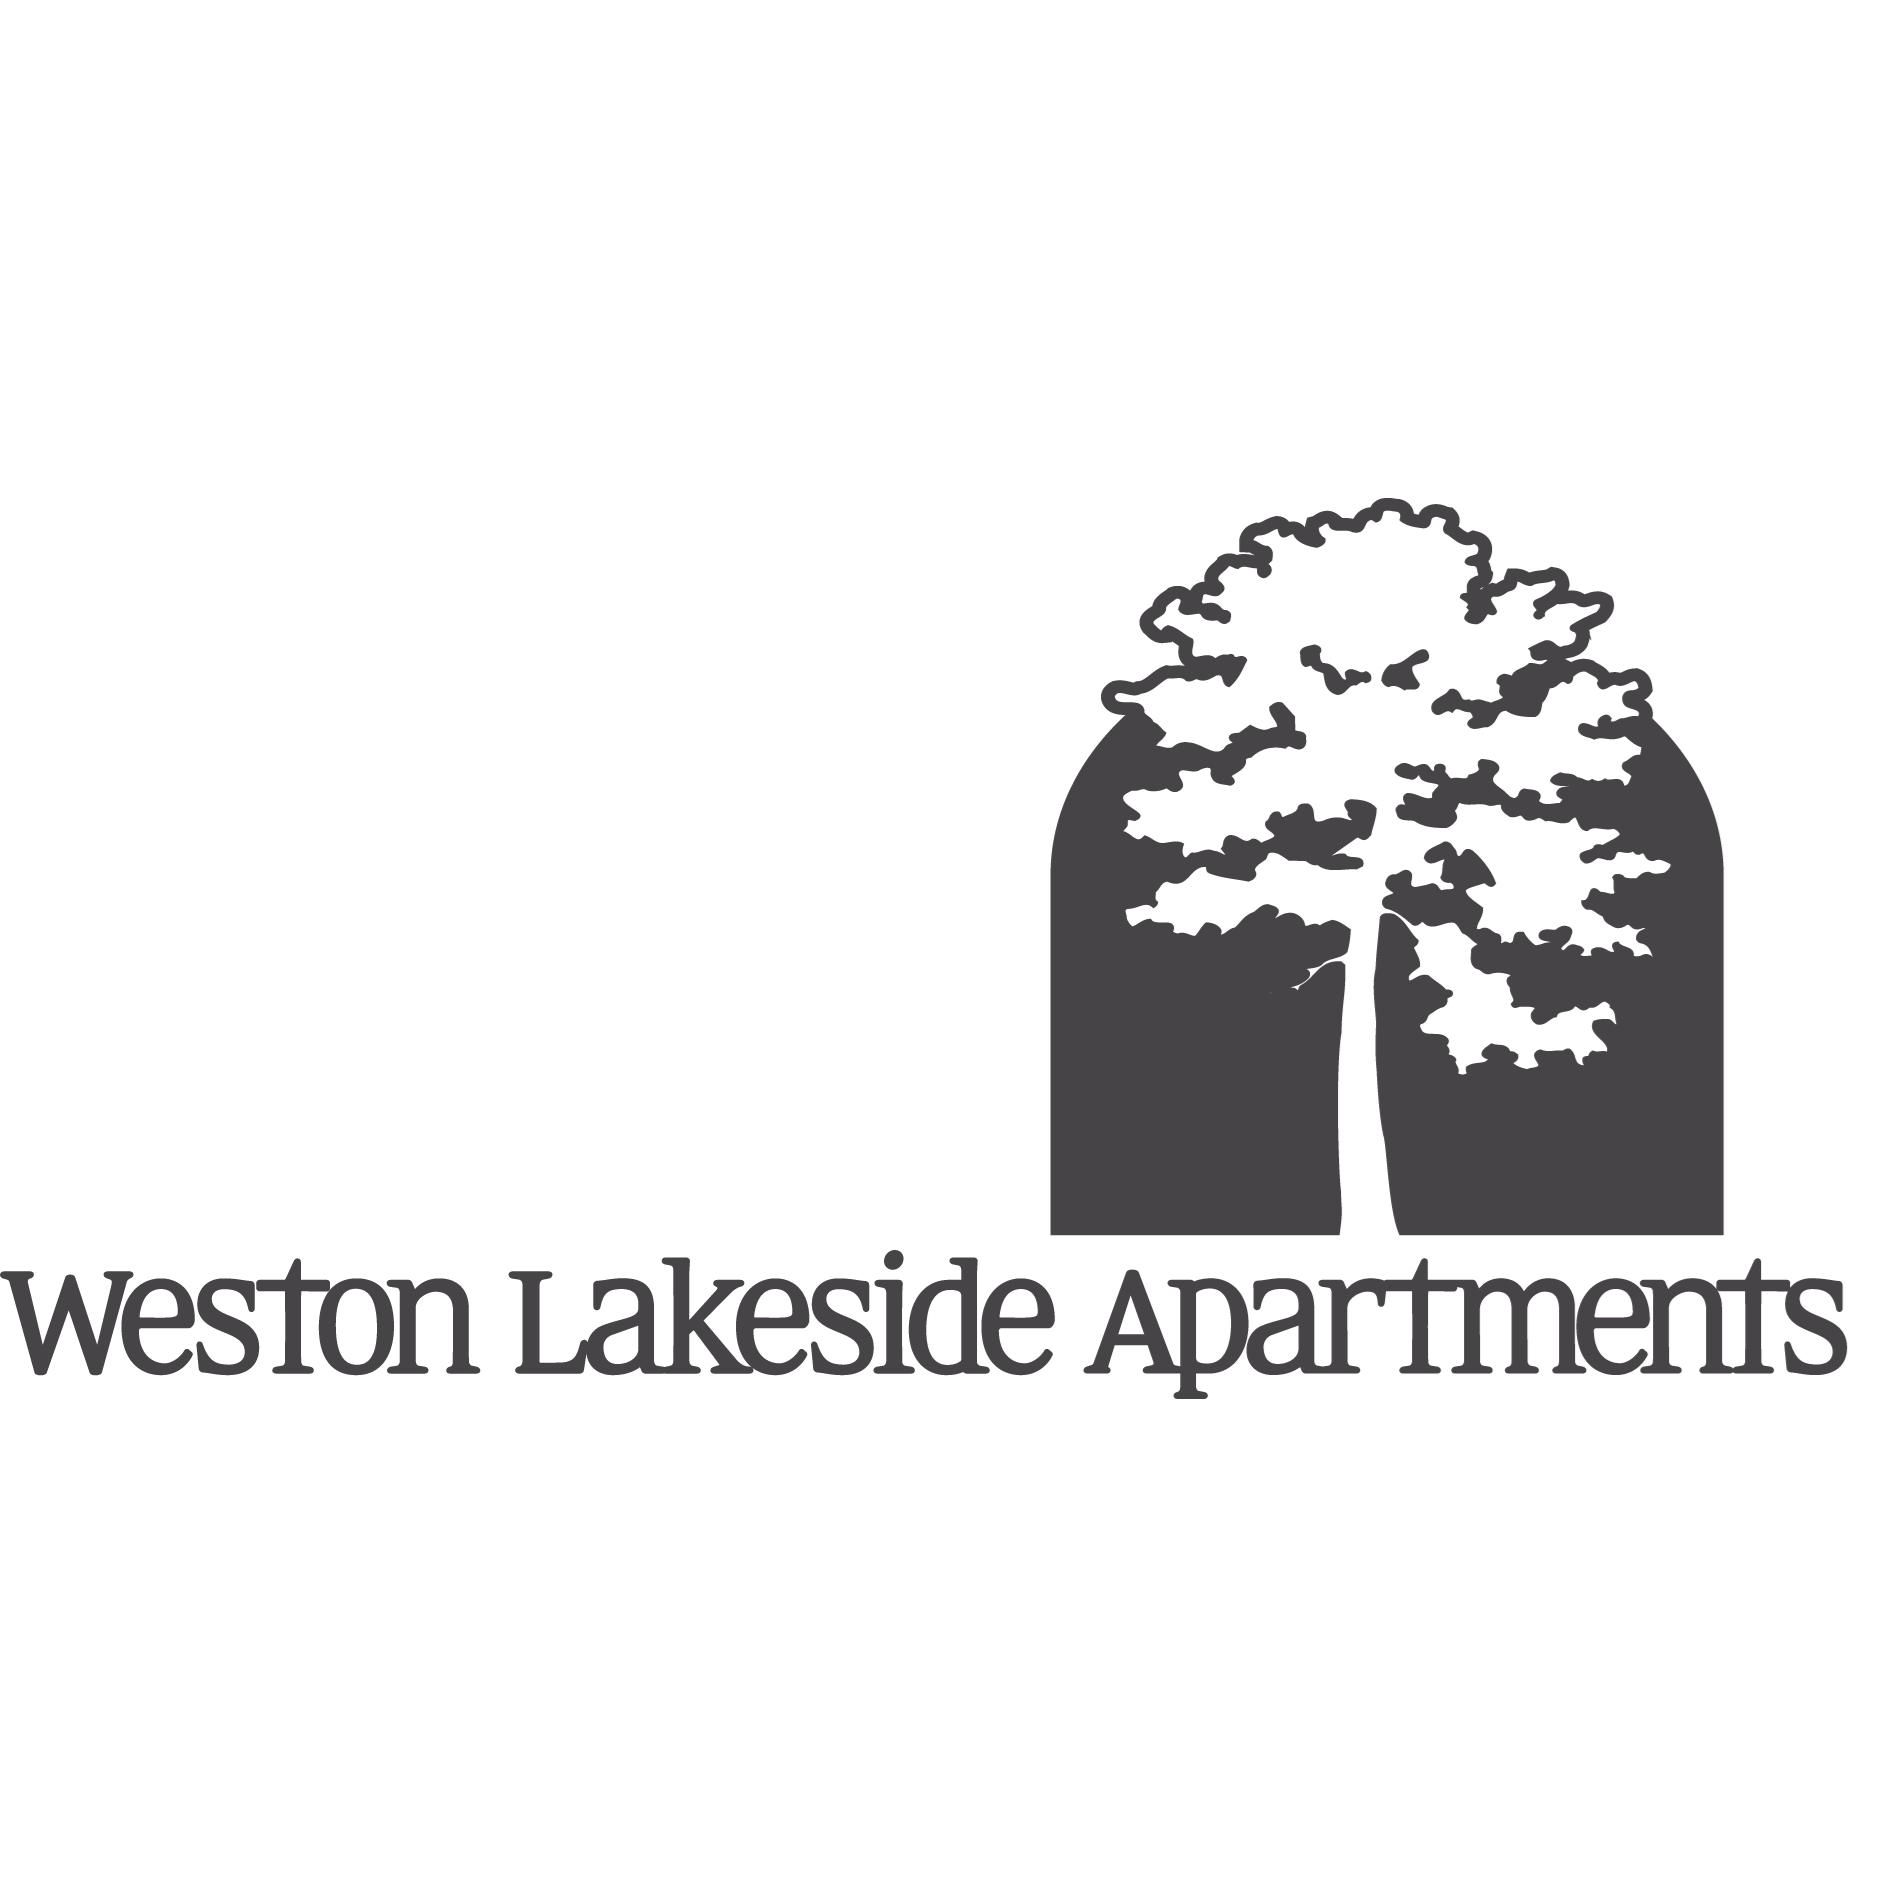 Weston Lakeside